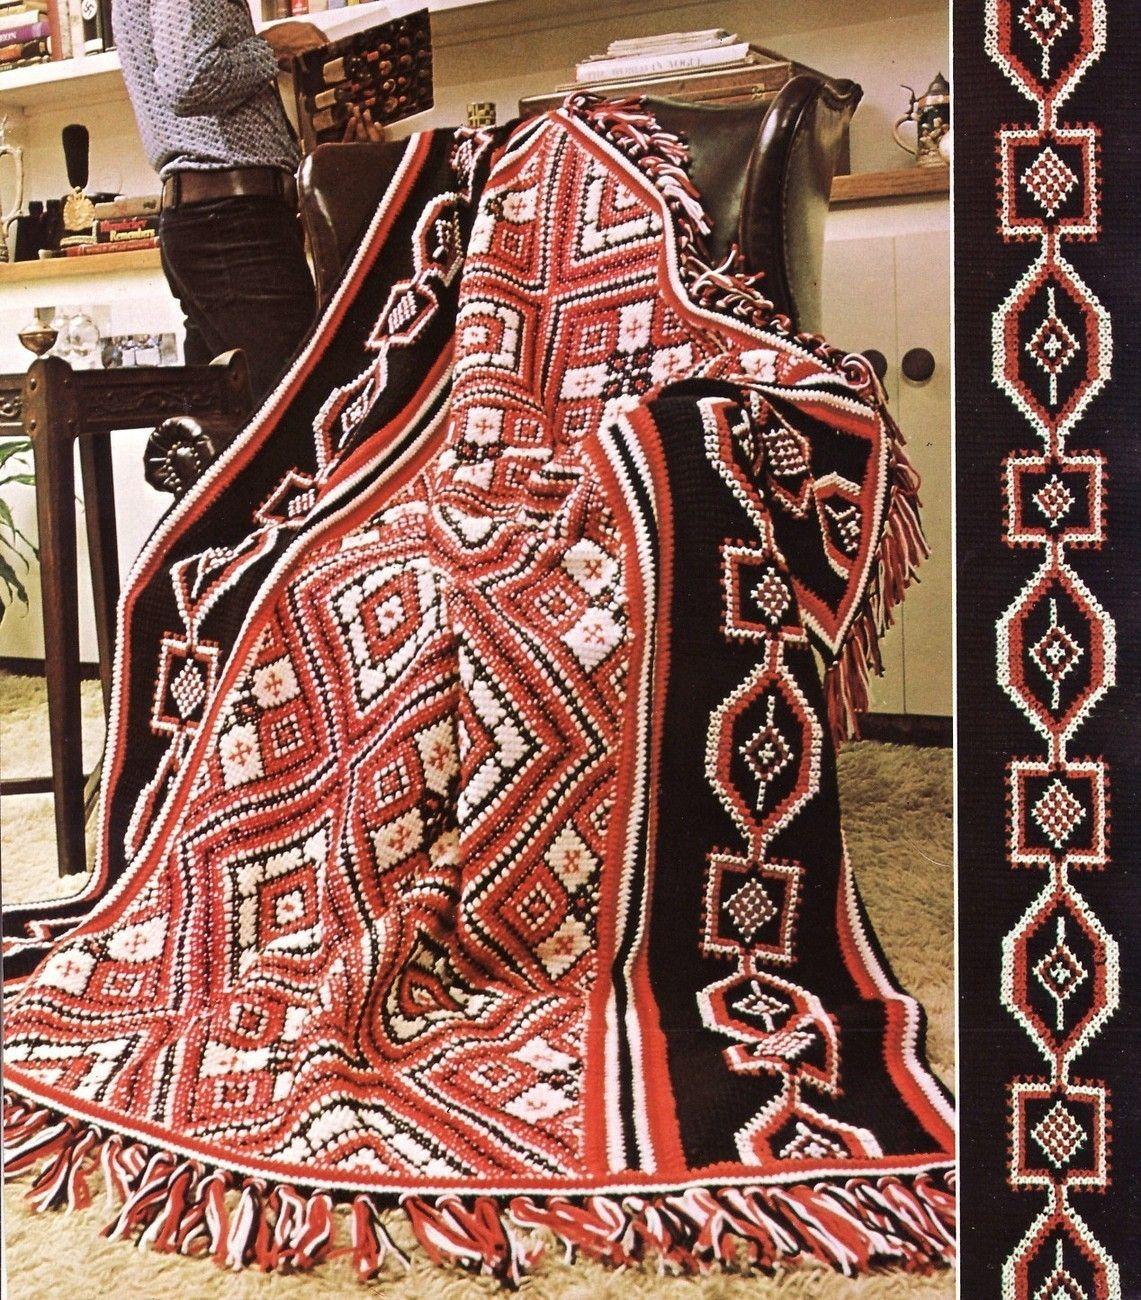 Indian Design Afghan Crochet Pattern Blanket Throw Fringe | Flecos ...